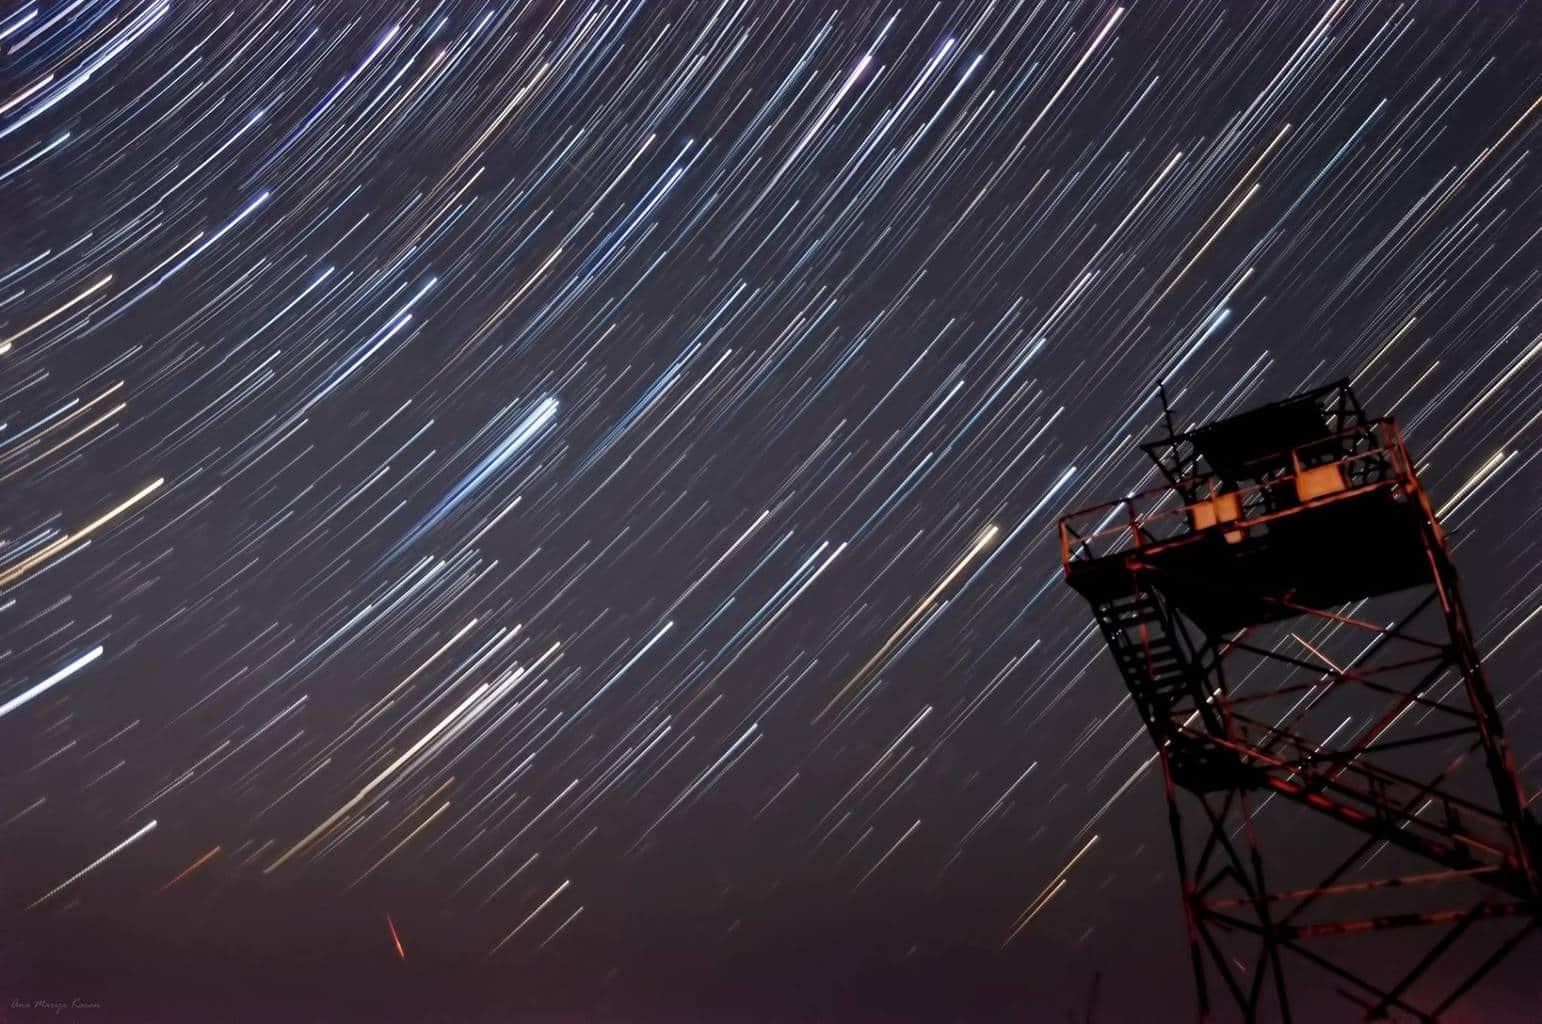 Star trails.  Rt Marlera, Croatia Composite of 104 shots, each of 30 seconds Nikon D90, Tamron 17-50mm